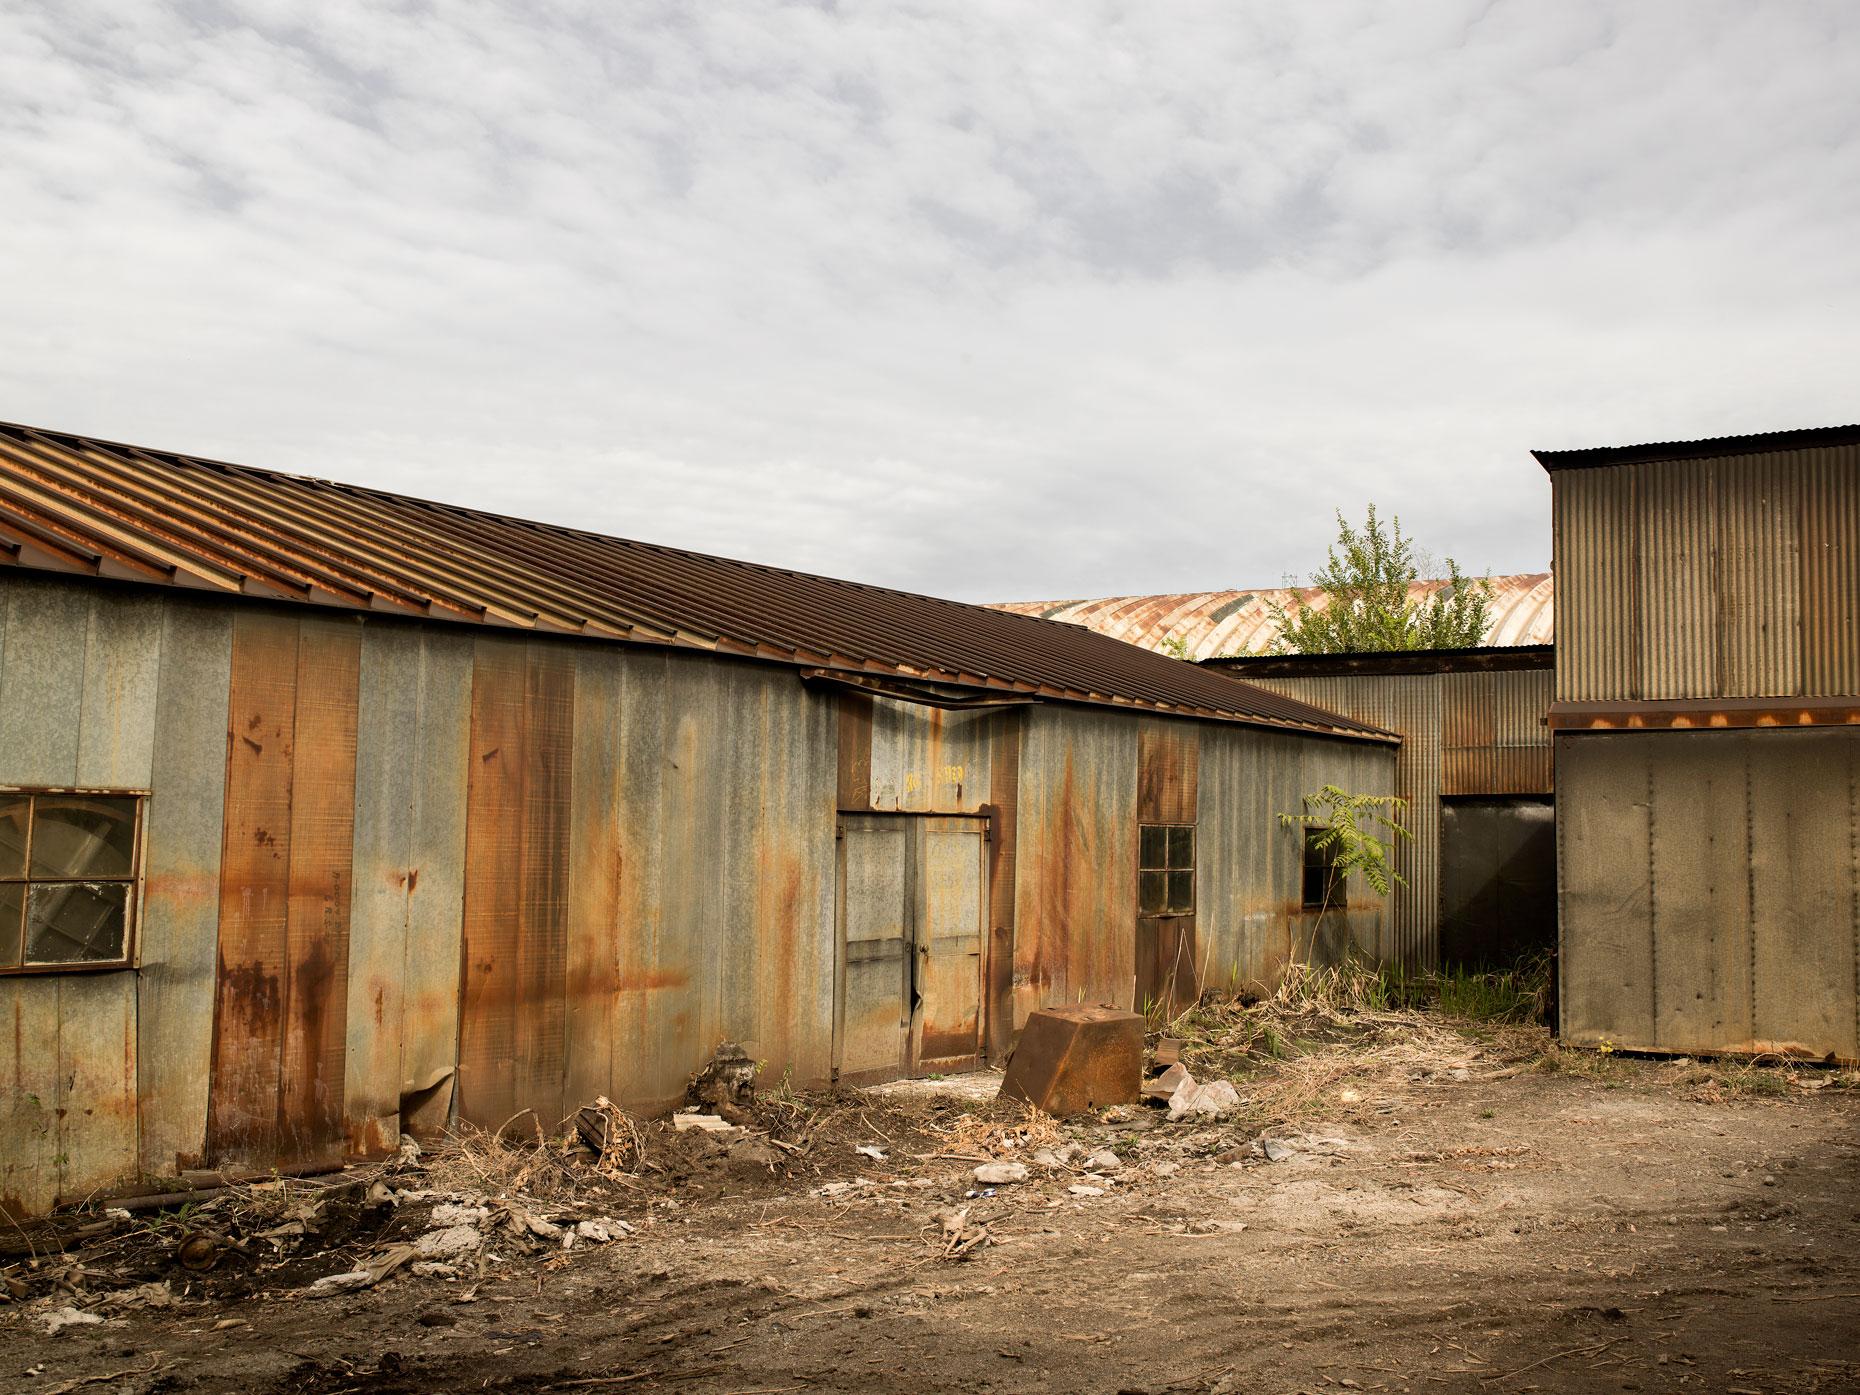 Projects-Editorial-Photography-Derek-Israelsen-003-Rust-Roof.jpg